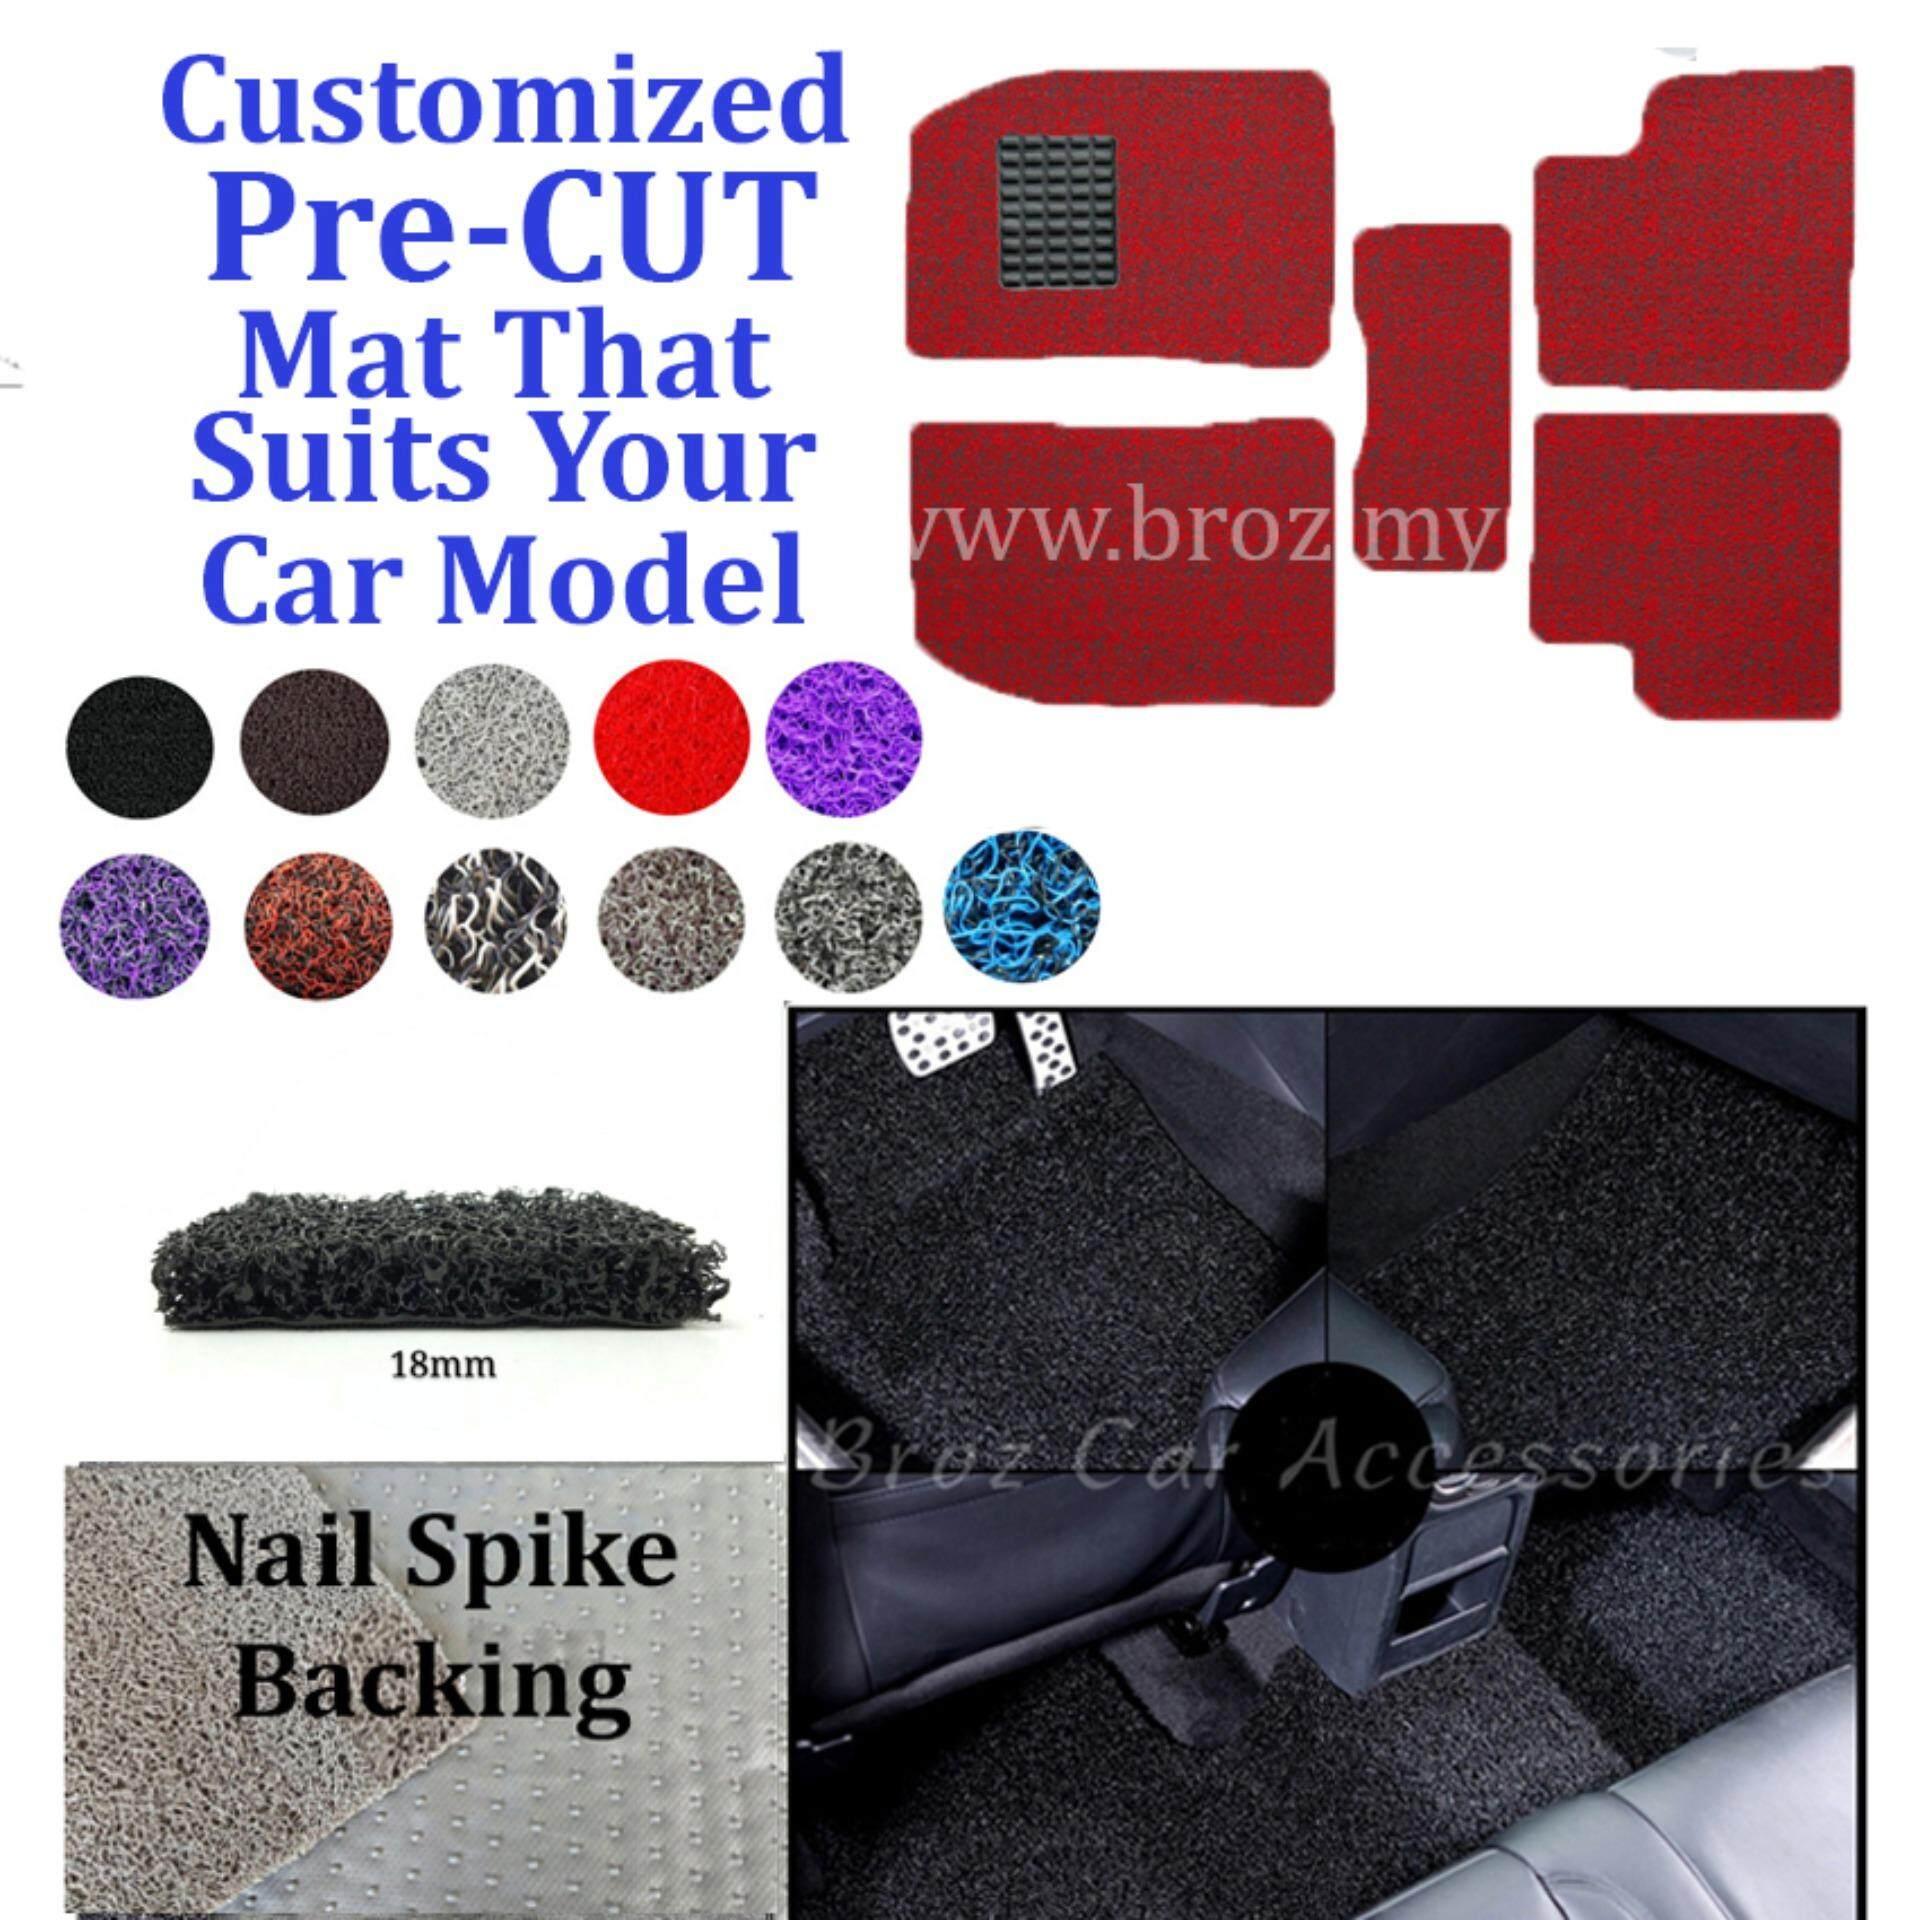 Broz Mercedes E-200 18MM Customized PRE CUT PVC Coil Floor Mat Anti Slip Carpet Nail Spike Backing - Red Black